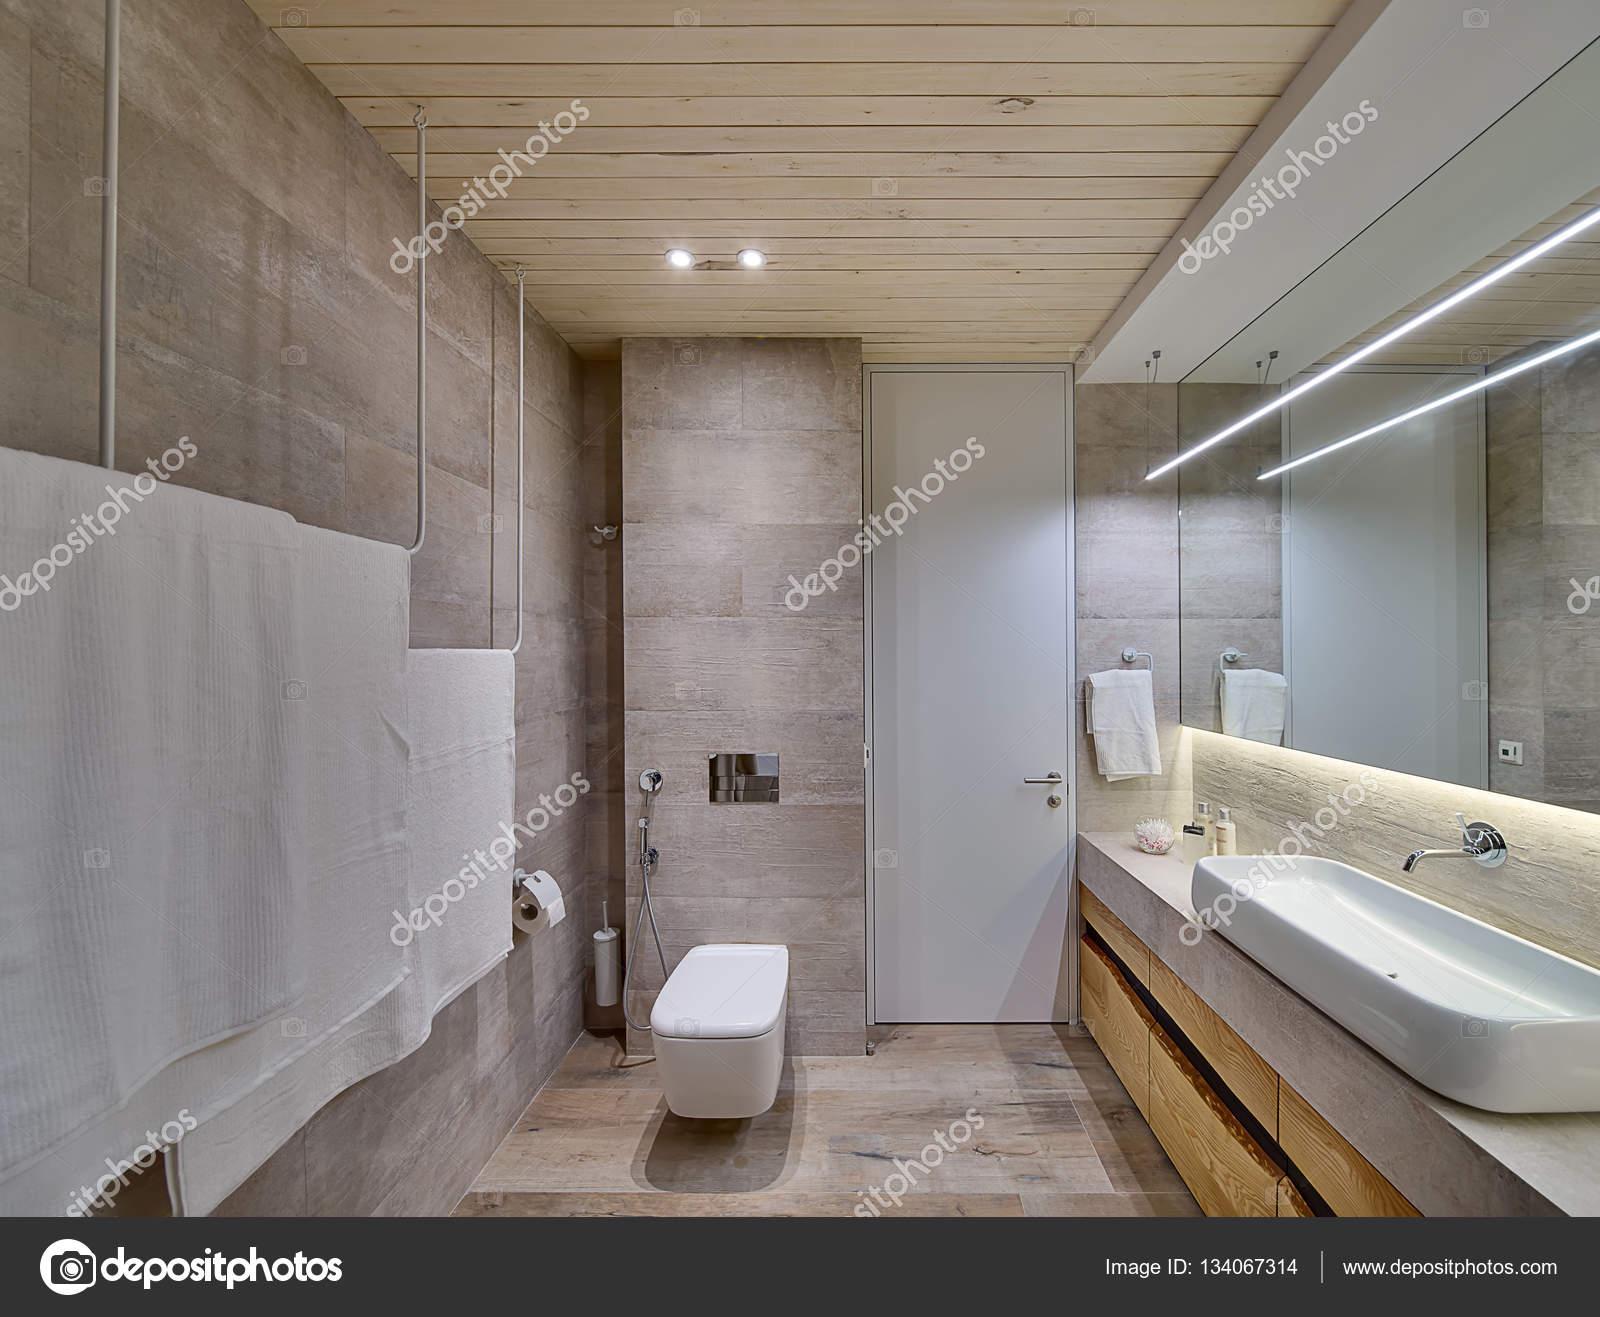 Kastje Badkamer Afbeeldingen : Moderne stijl badkamer u stockfoto bezikus